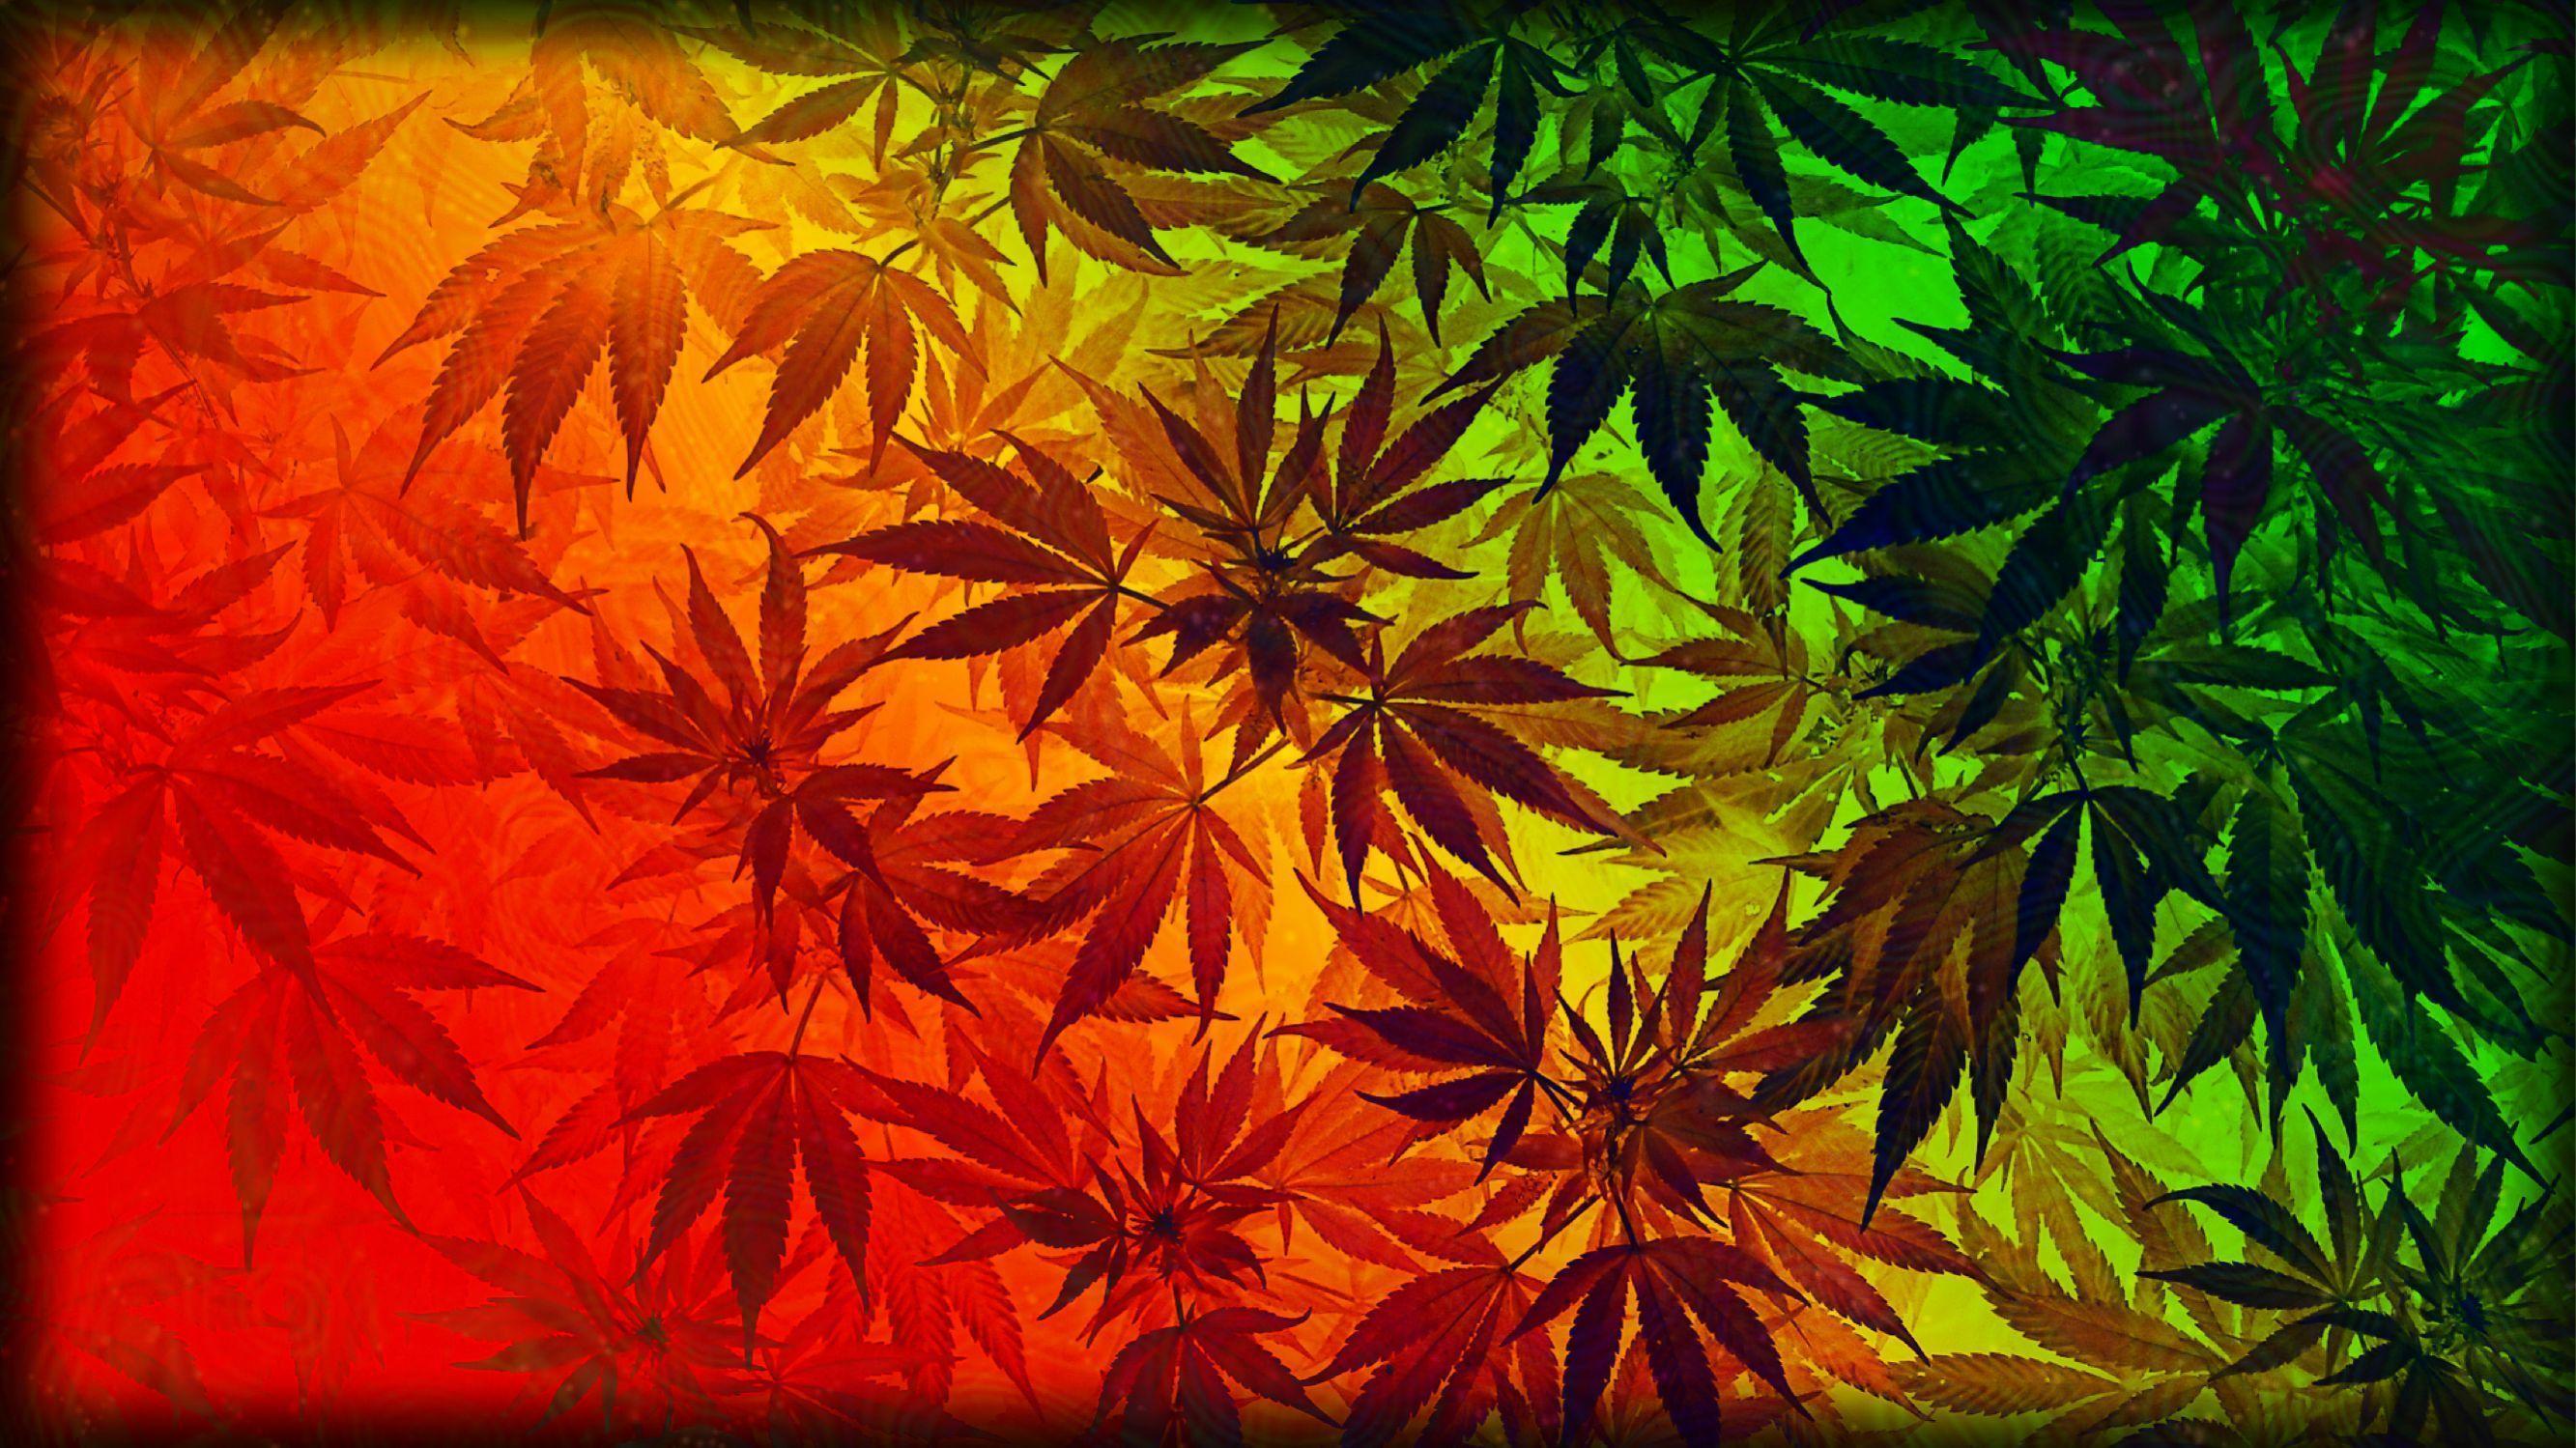 Bob Marley Wallpaper Hd Iphone 6 Ganja Wallpapers Wallpaper Cave